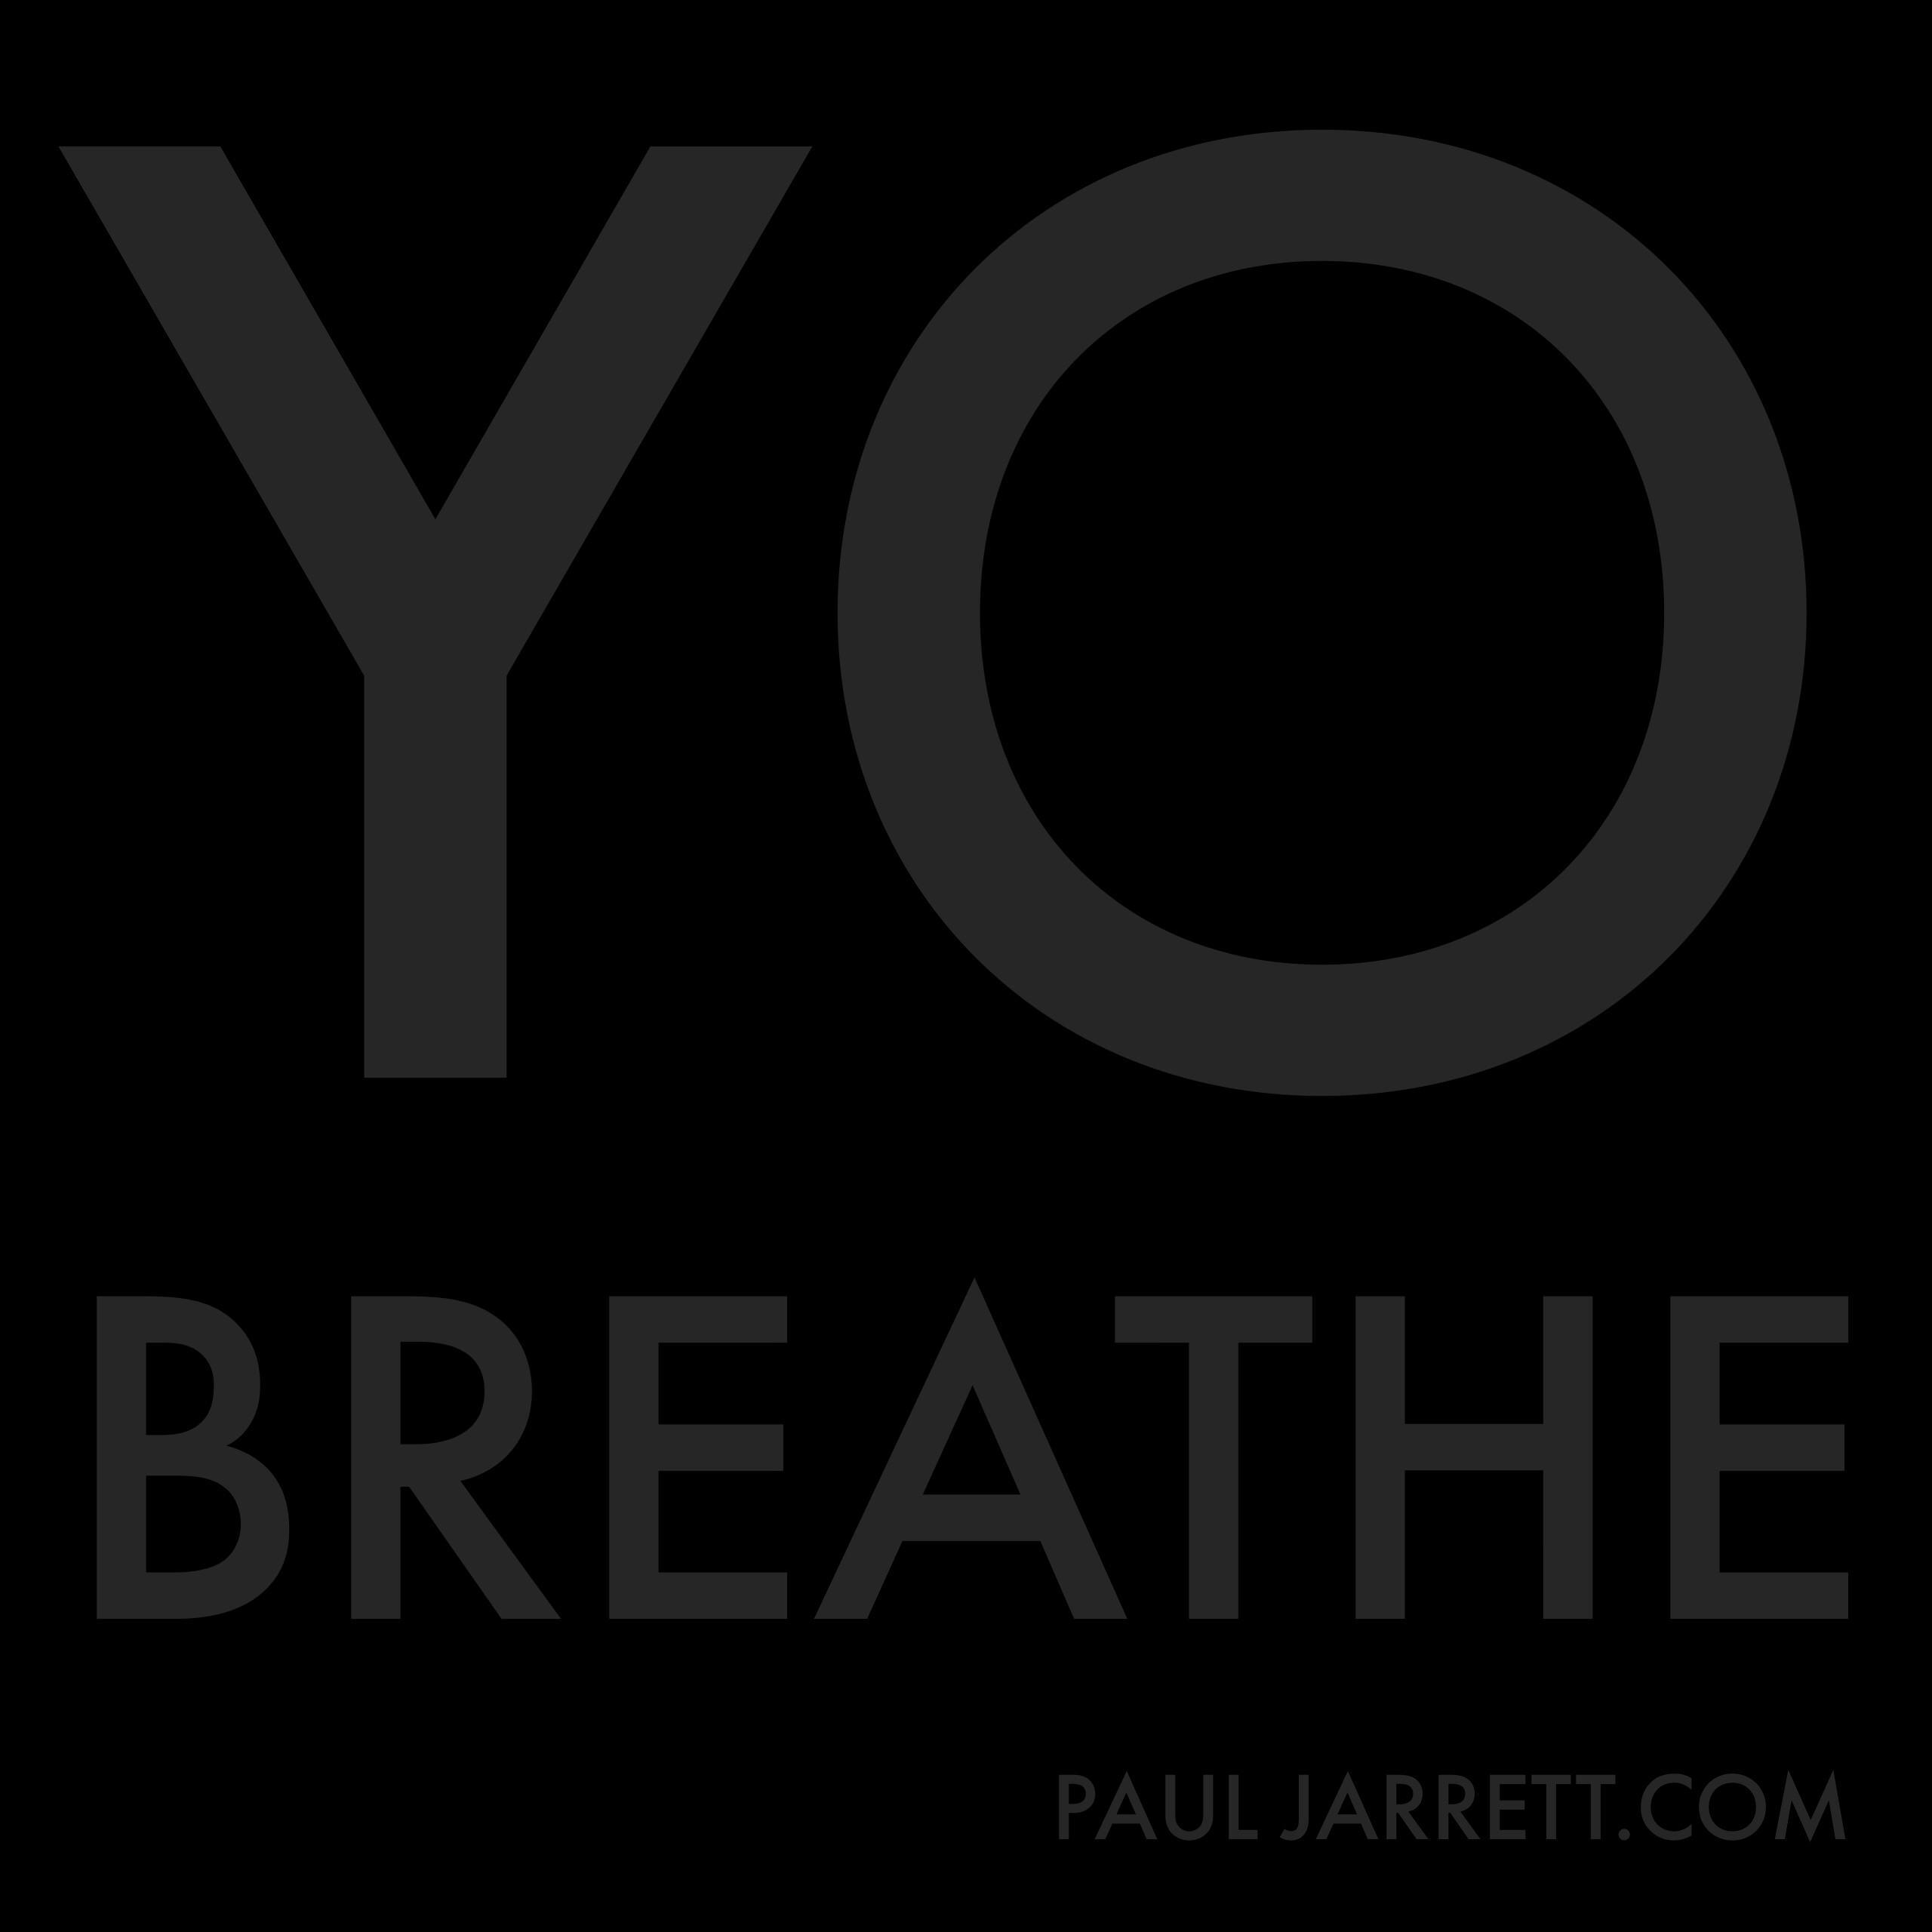 BREATH E PAUL JARRETT.COM https://inspirational.ly